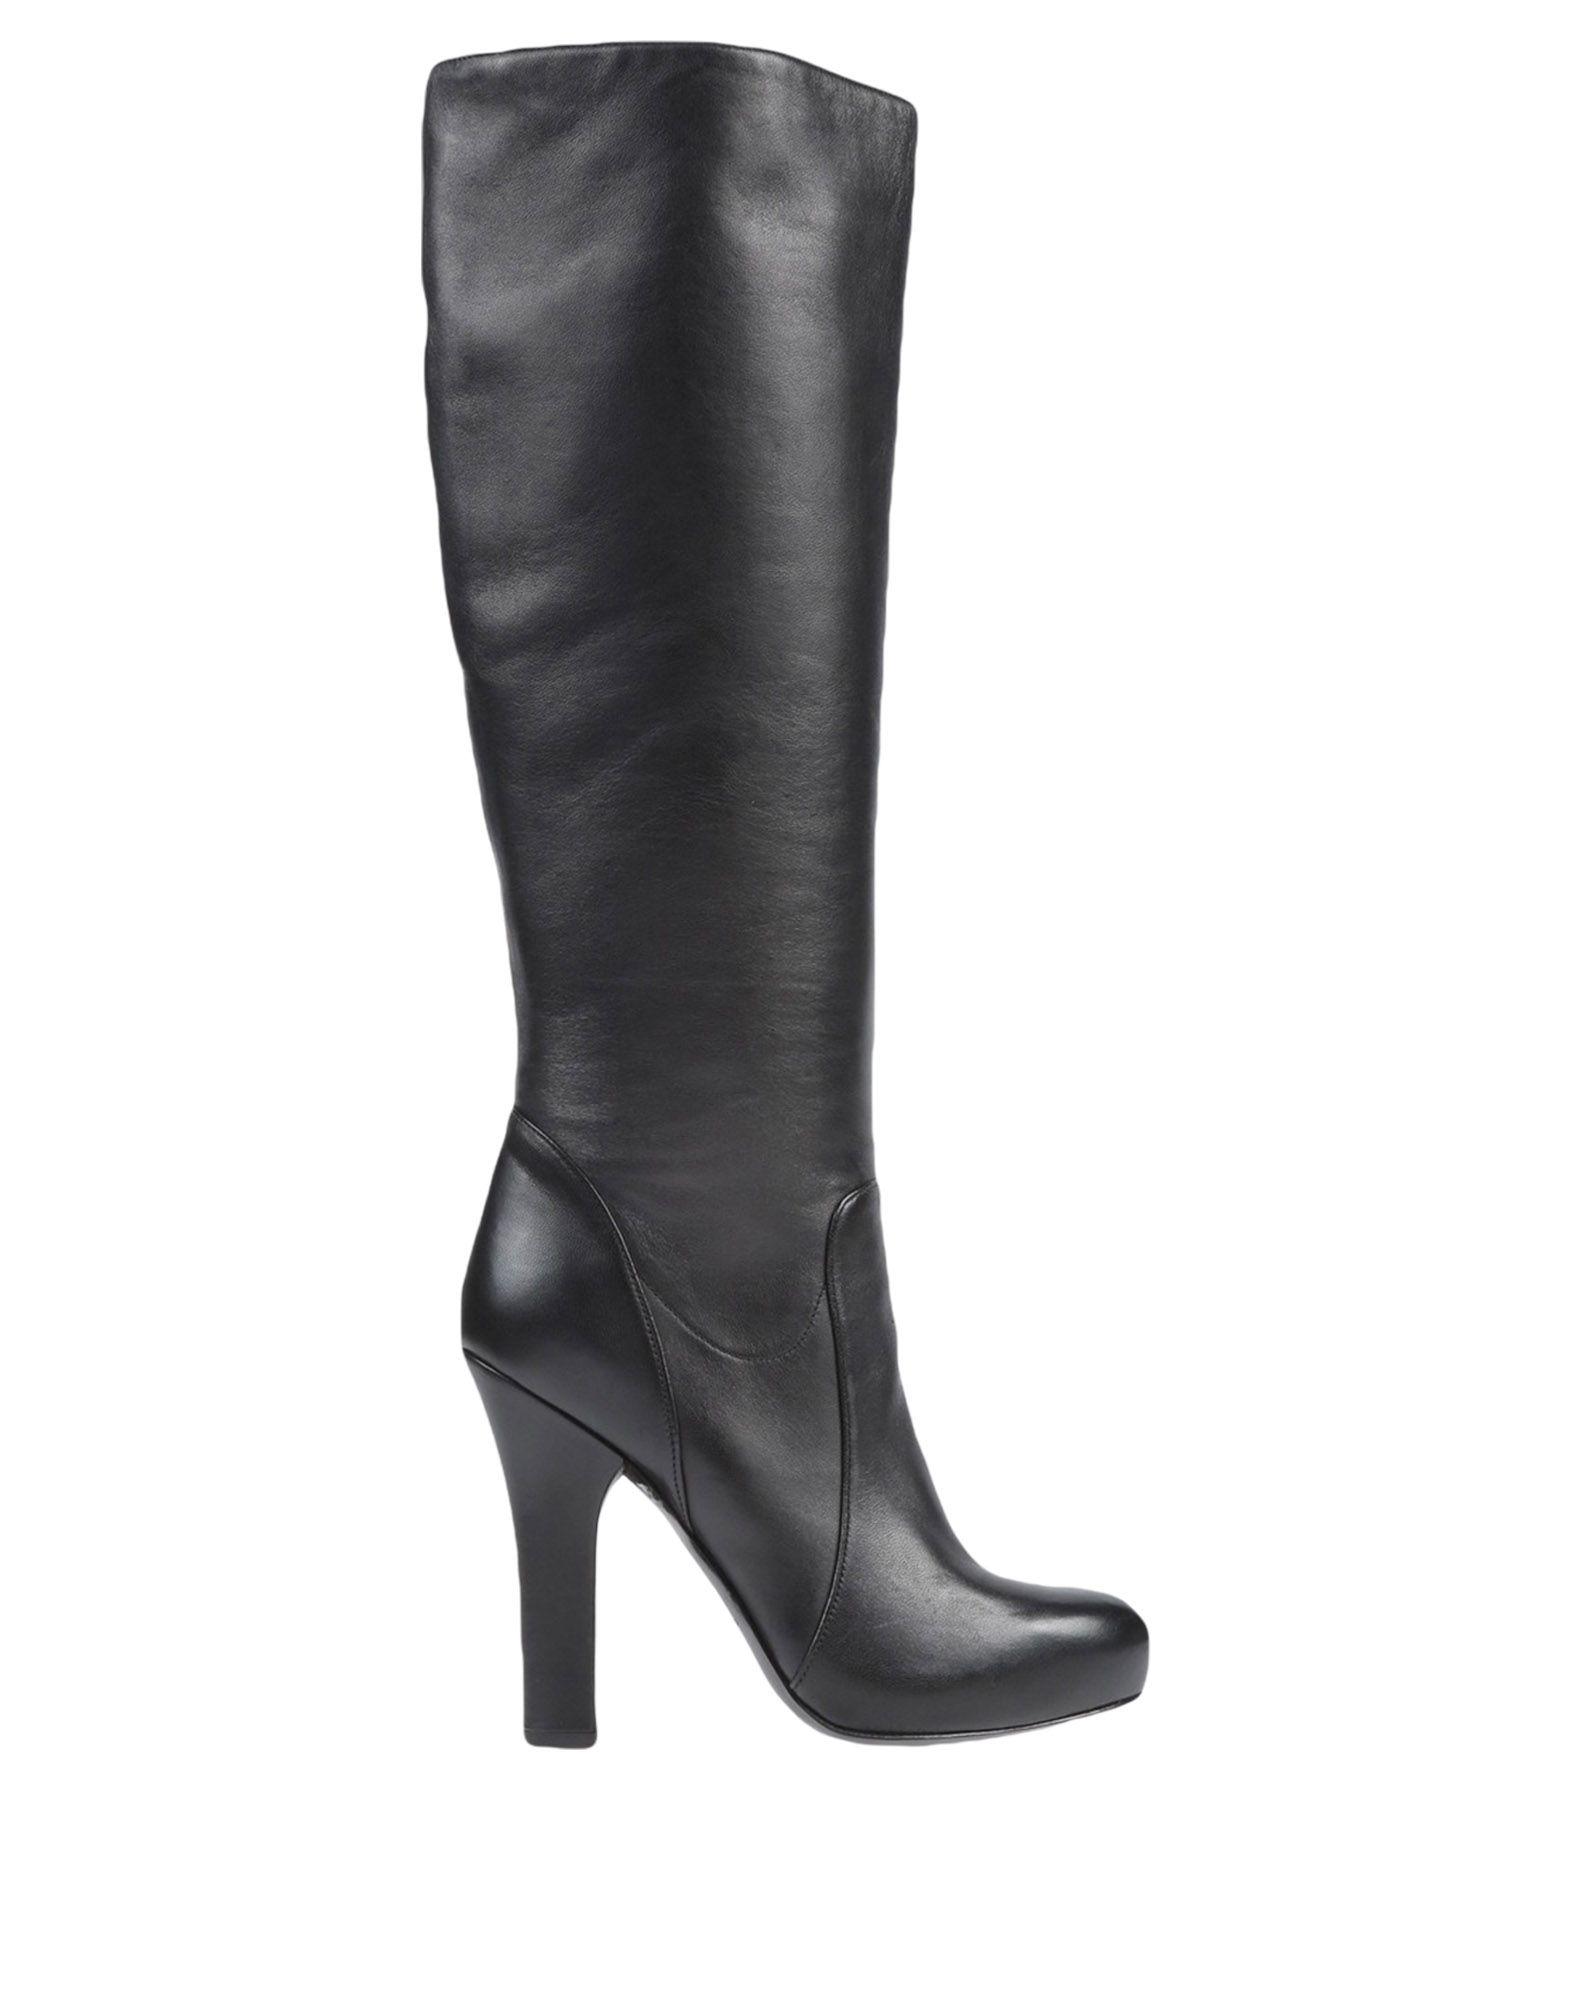 Dolce & Gabbana Boots - Women Dolce on & Gabbana Boots online on Dolce  Australia - 11535927NP 6980c4